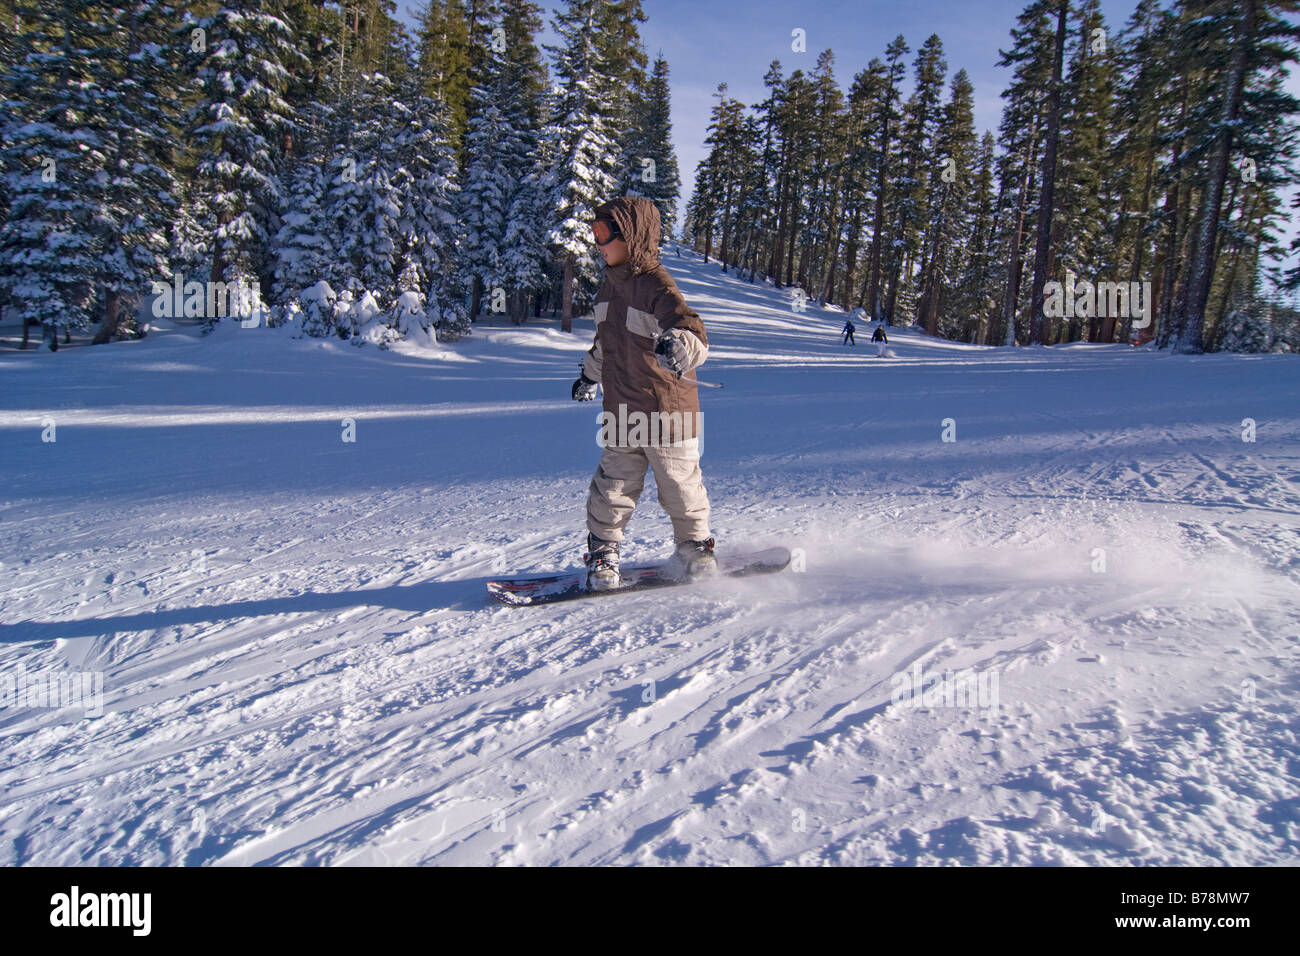 a boy snowboarding at sierra at tahoe ski resort near lake tahoe in